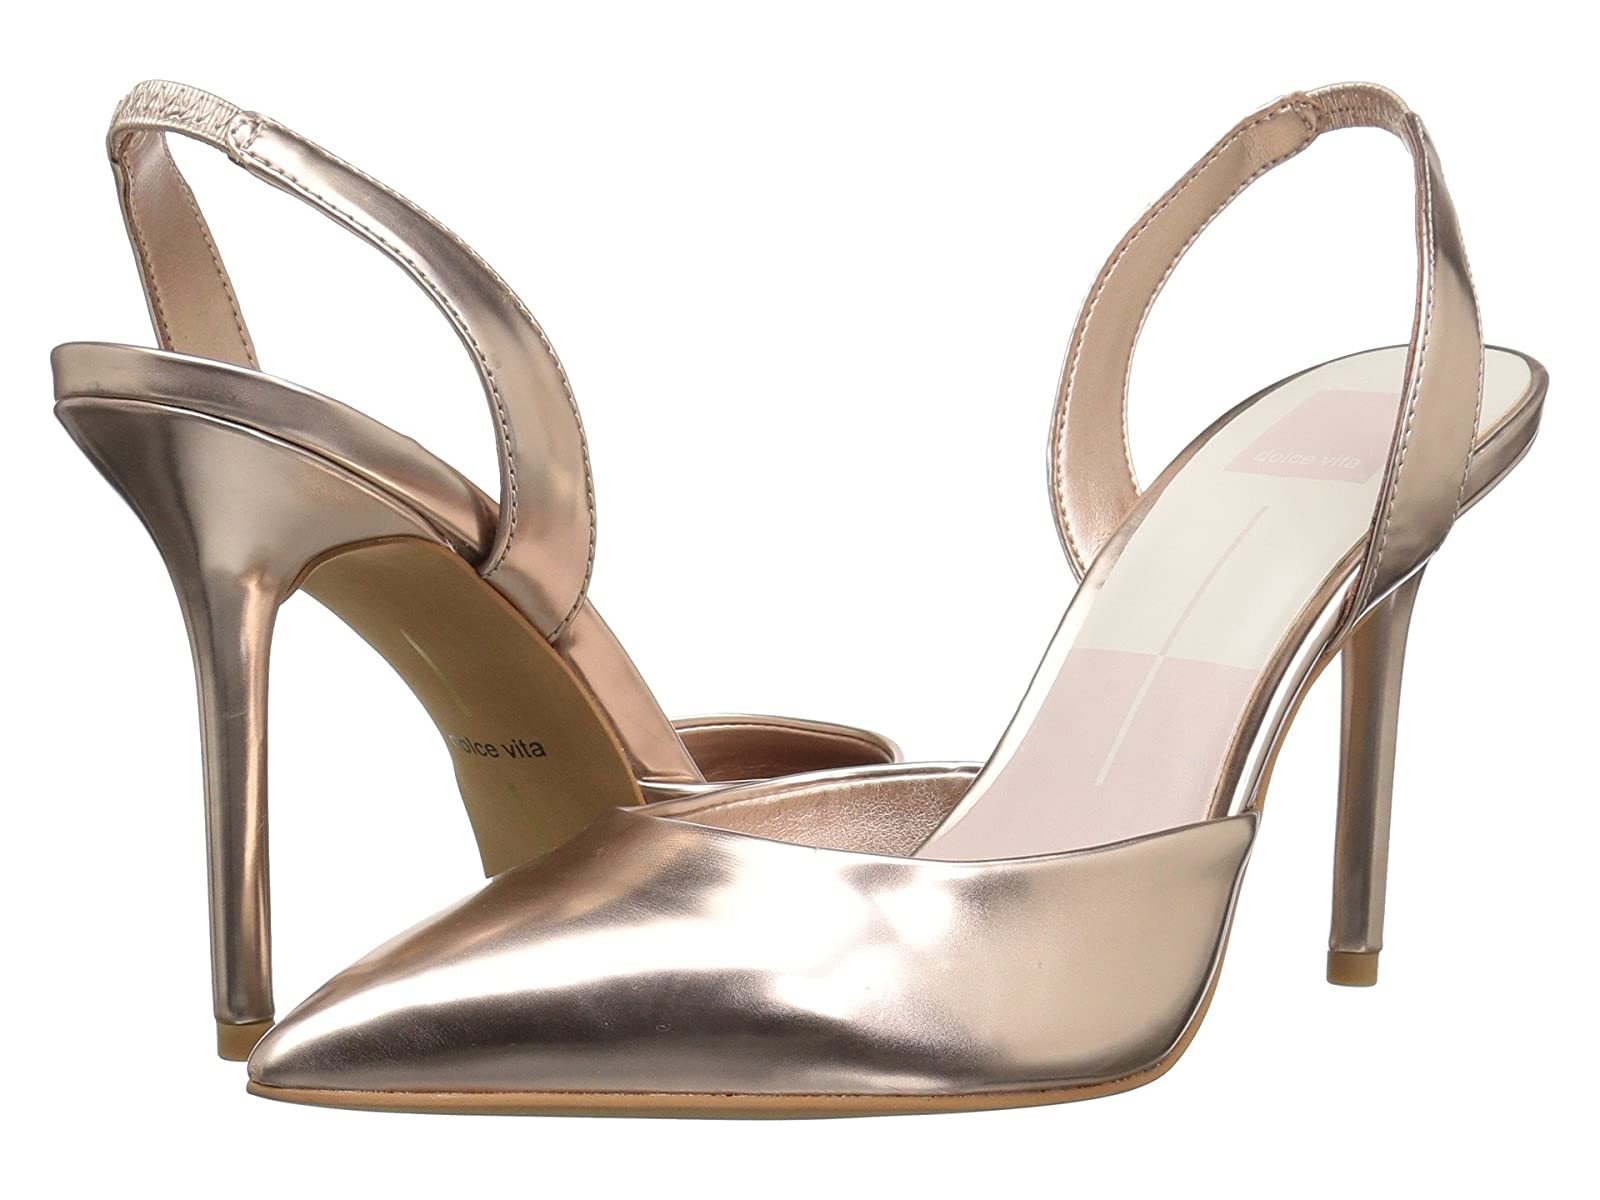 Dolce Vita MaureenCheap and distinctive eye-catching shoes